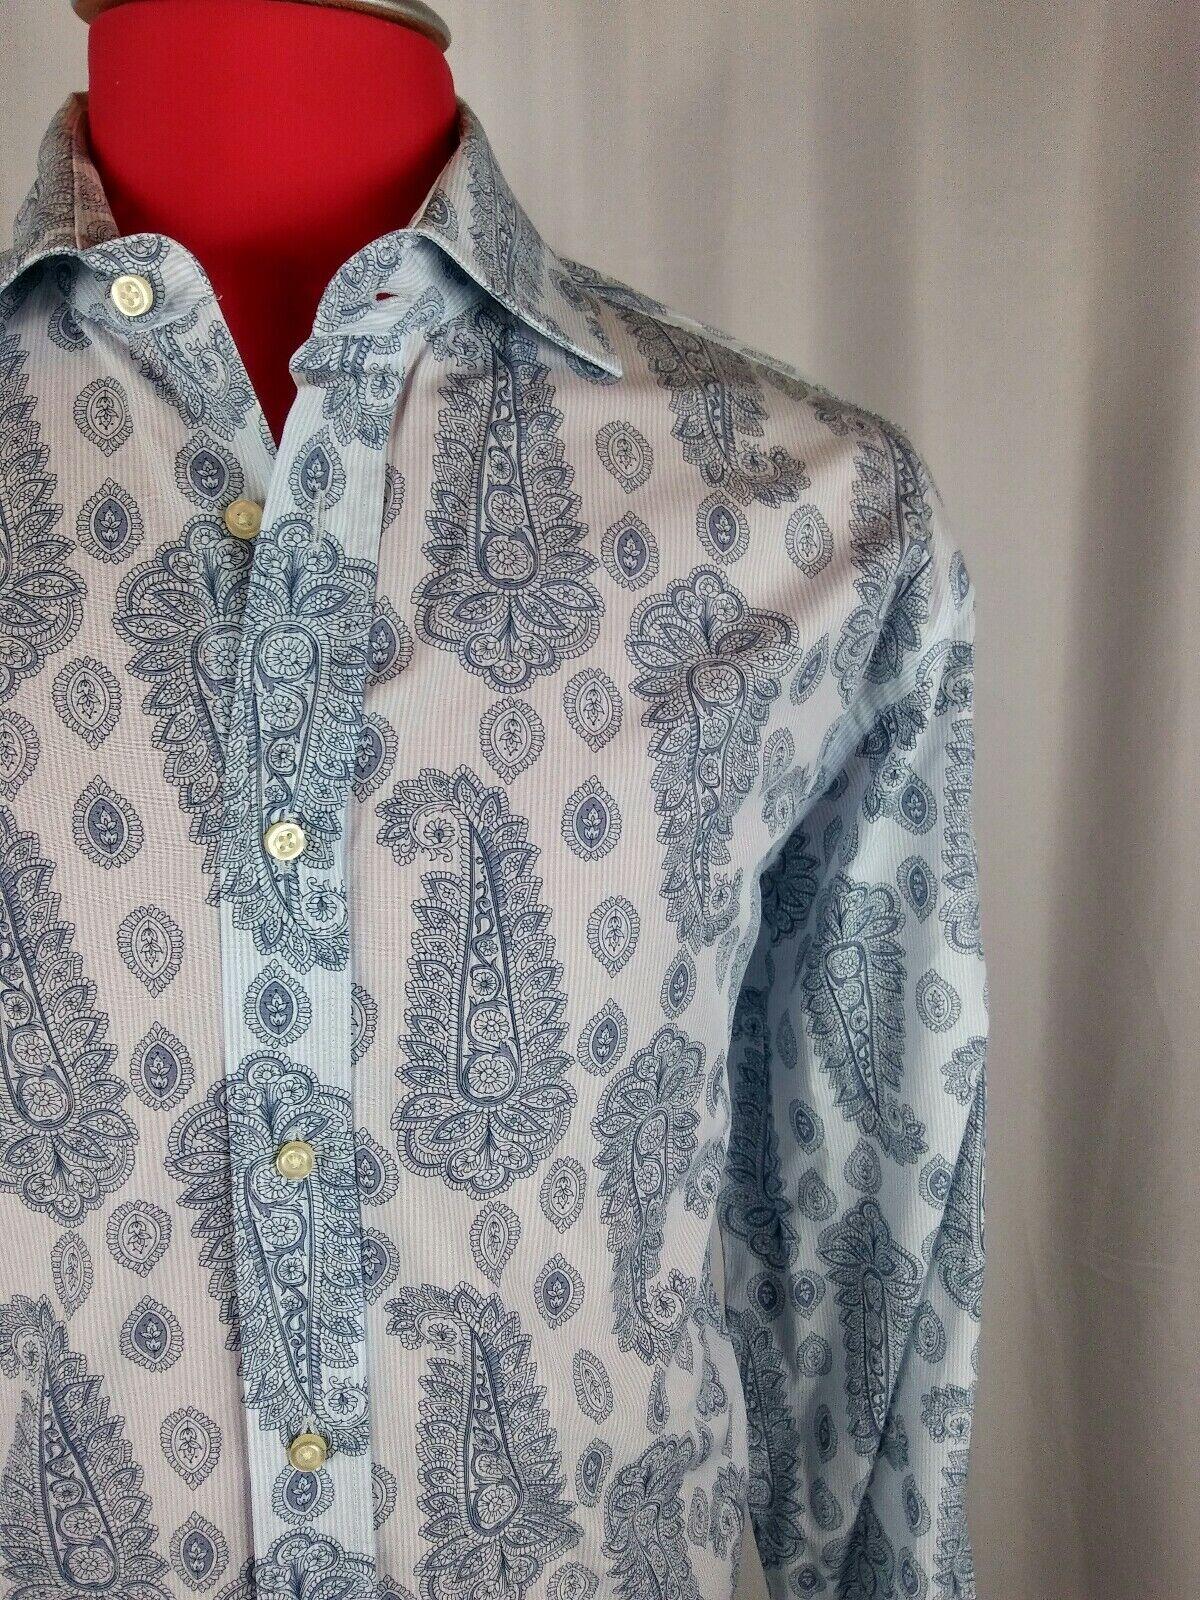 Scott James shirt XL TG 17 1 2 44 cm  de largo mangas Azteca Designs  orden ahora disfrutar de gran descuento